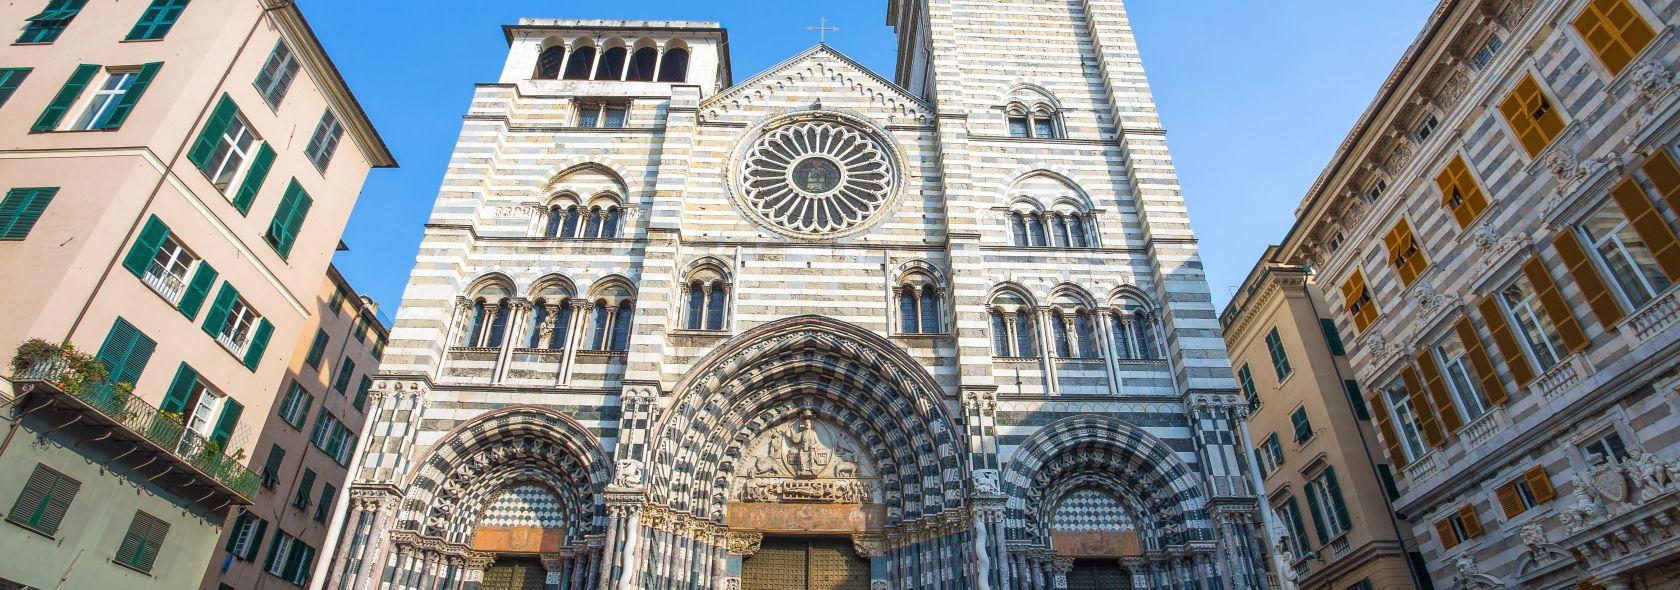 Cathedral of San Lorenzo - Adobe Stock - Liguria Digitale